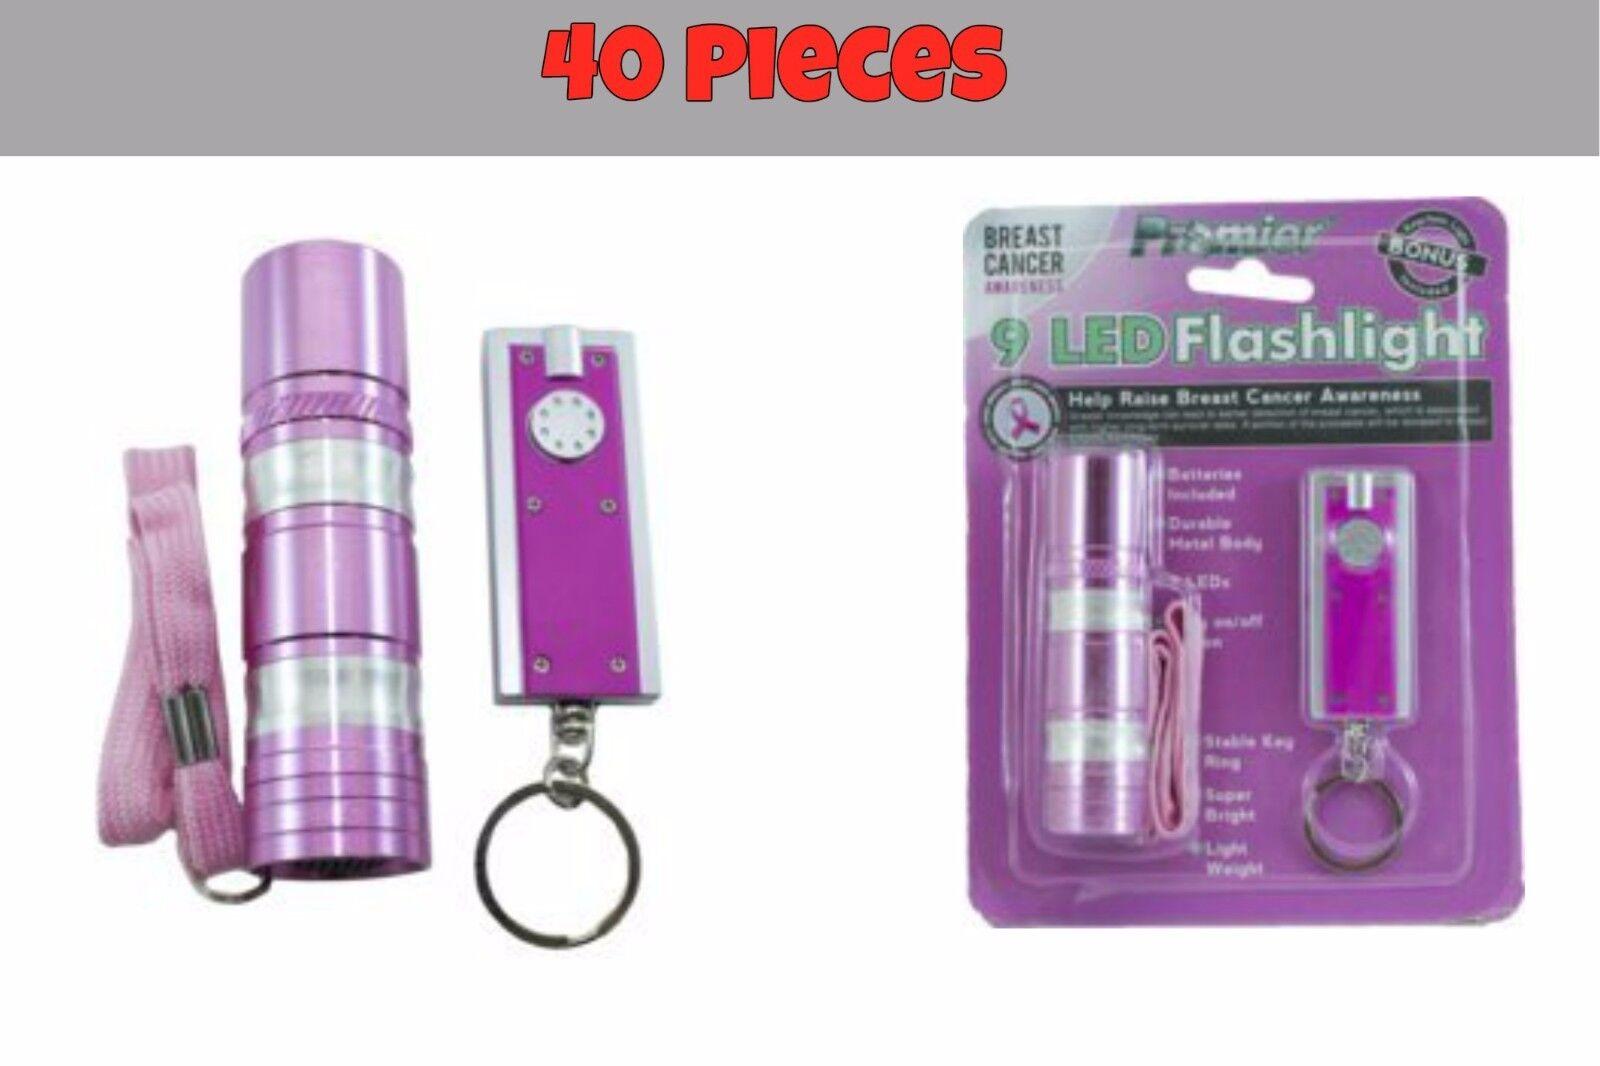 40 Super Bright LED Mini Metal Body Flashlight+Classic Thin Keychain Flashlight